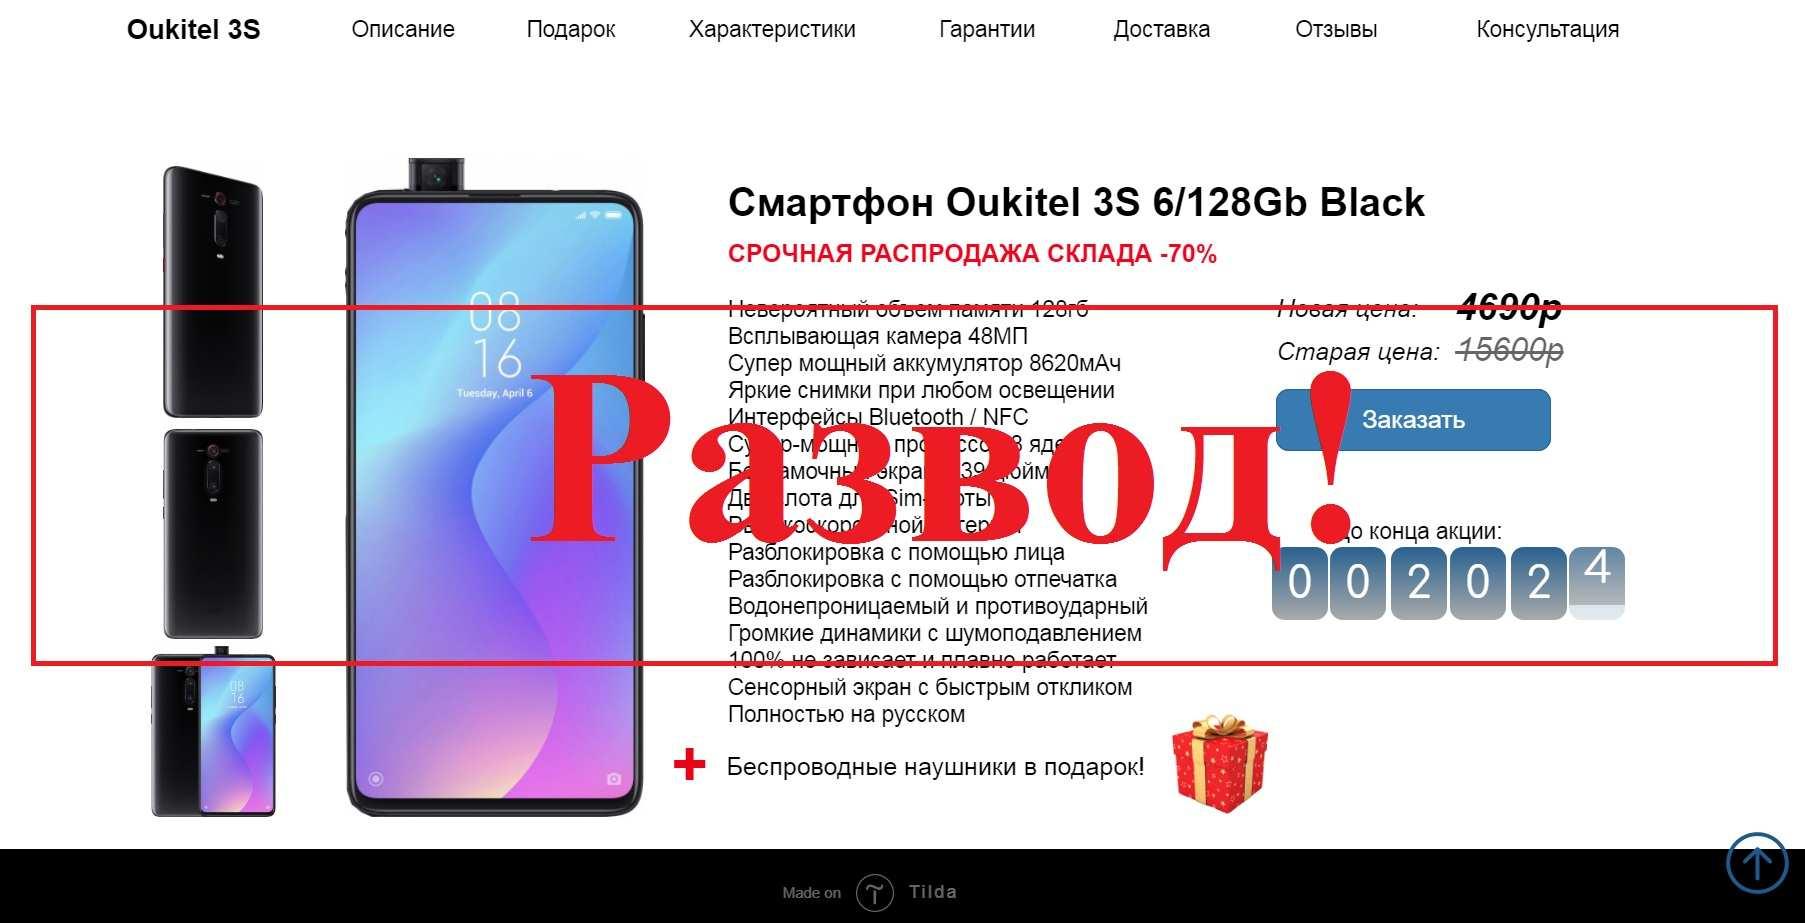 Смартфон Oukitel 3S 6/128Gb Black – отзывы о https://oukitel-3s.tilda.ws